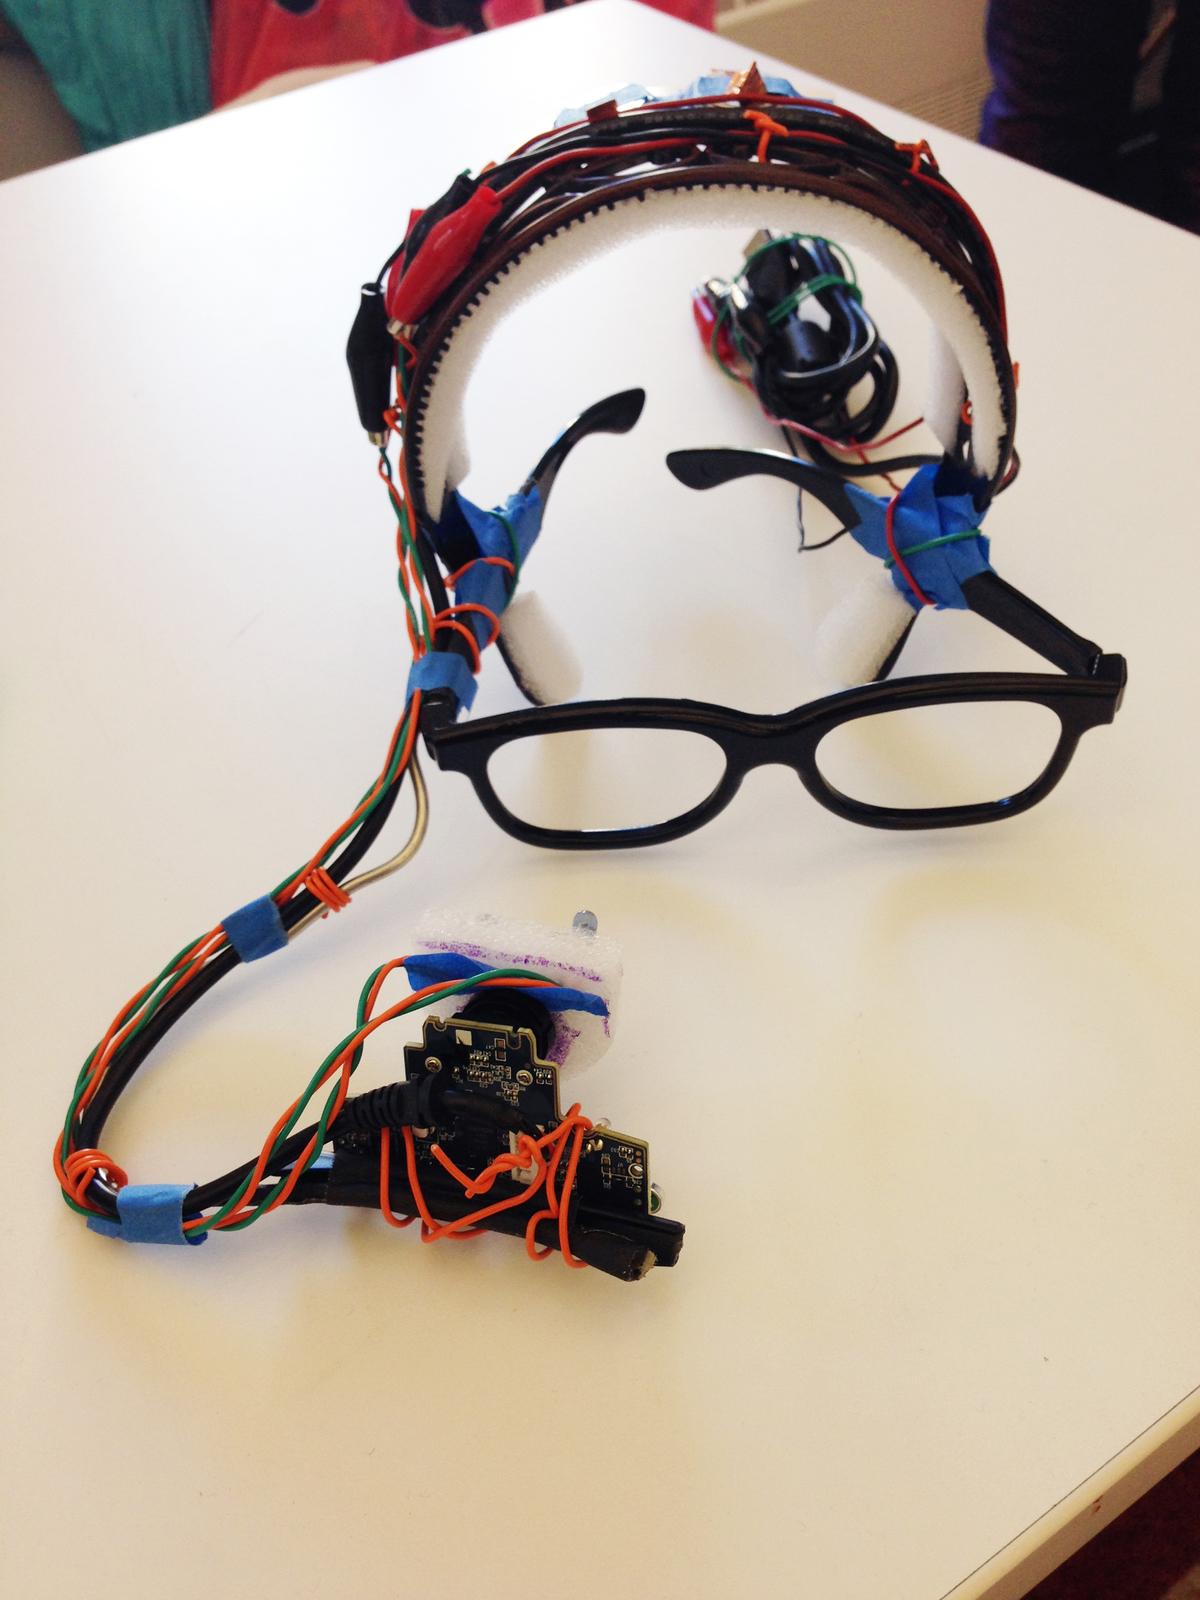 Eye tracker for Eye on Art. Image via Christopher Chafin for The New School.